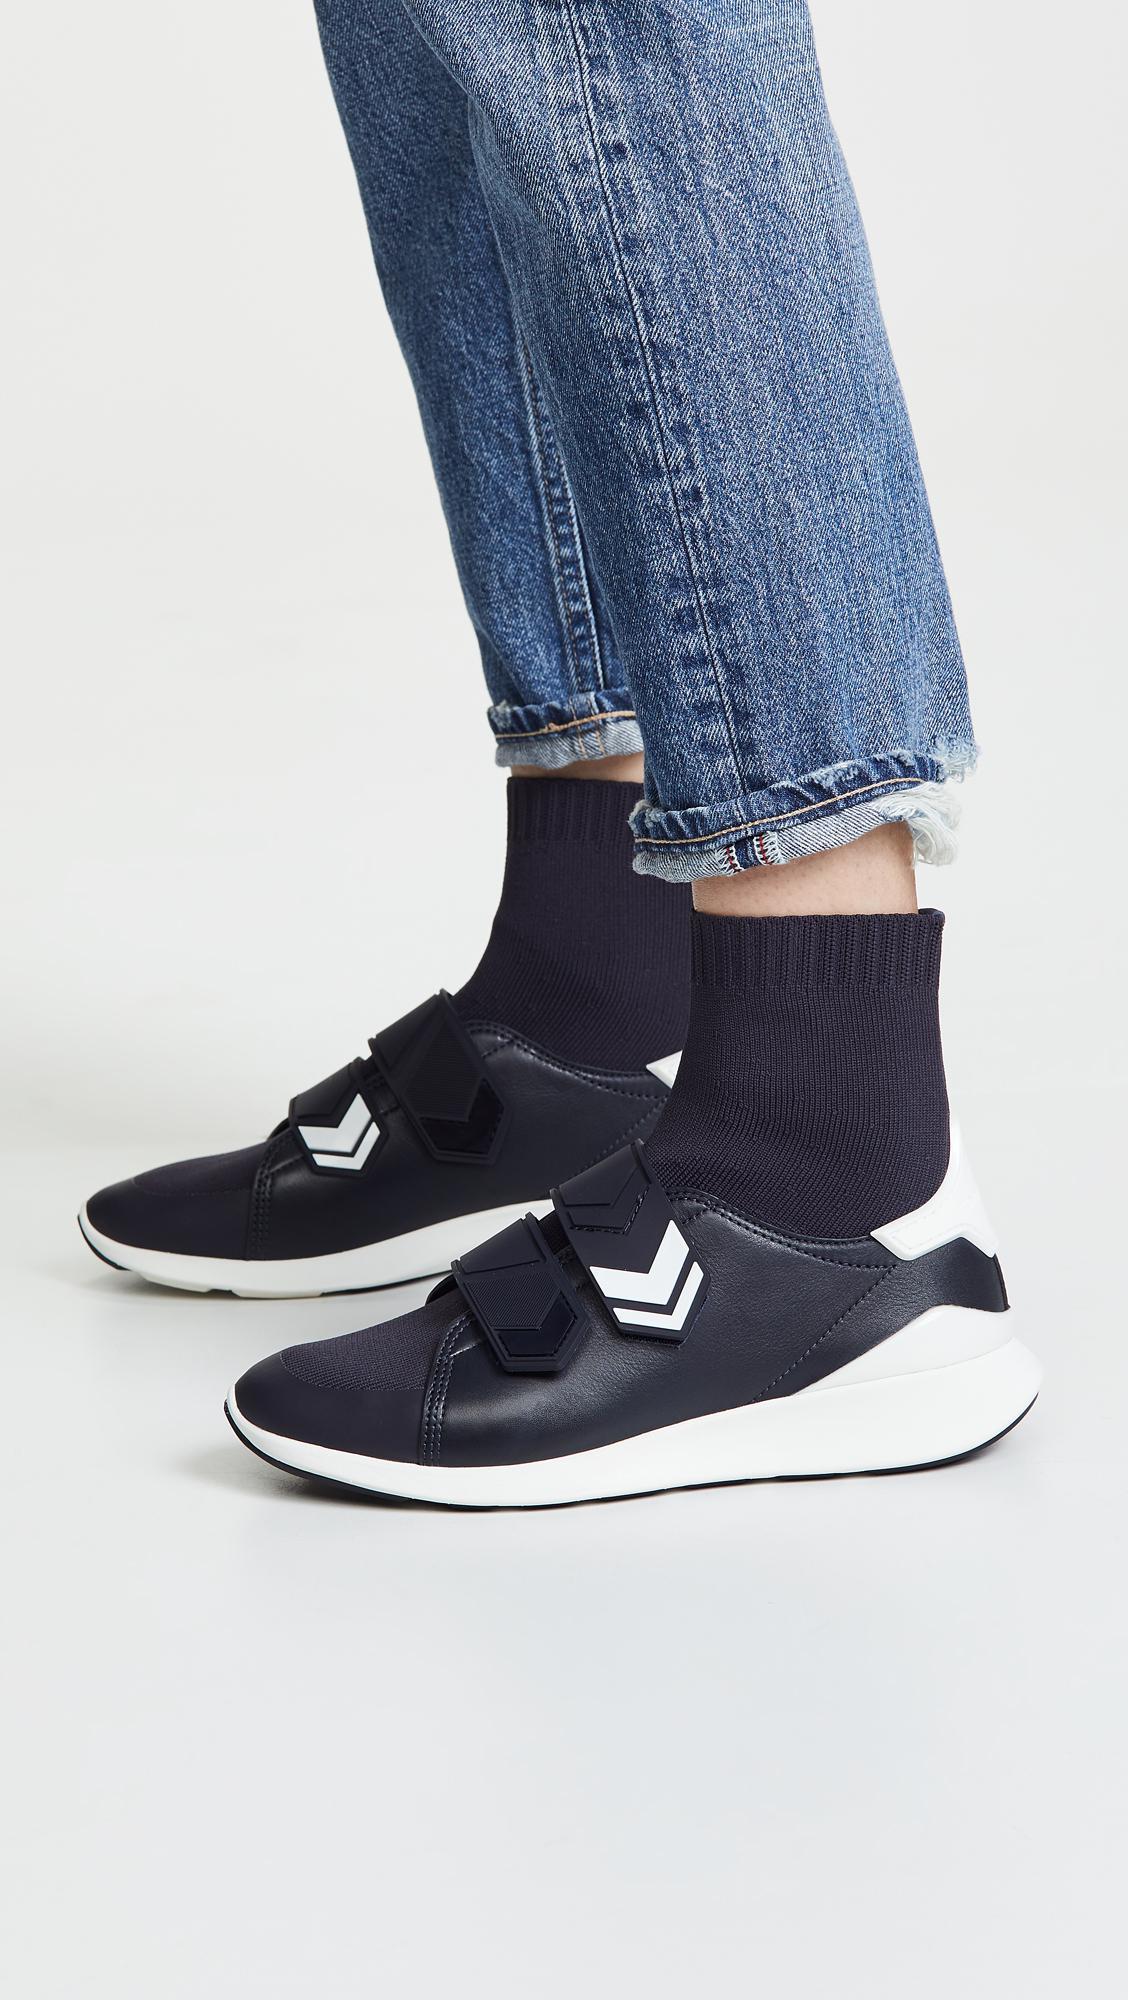 5f1eabdd14b7 Tory Sport - Blue Chevron Sock Sneaker - Lyst. View fullscreen